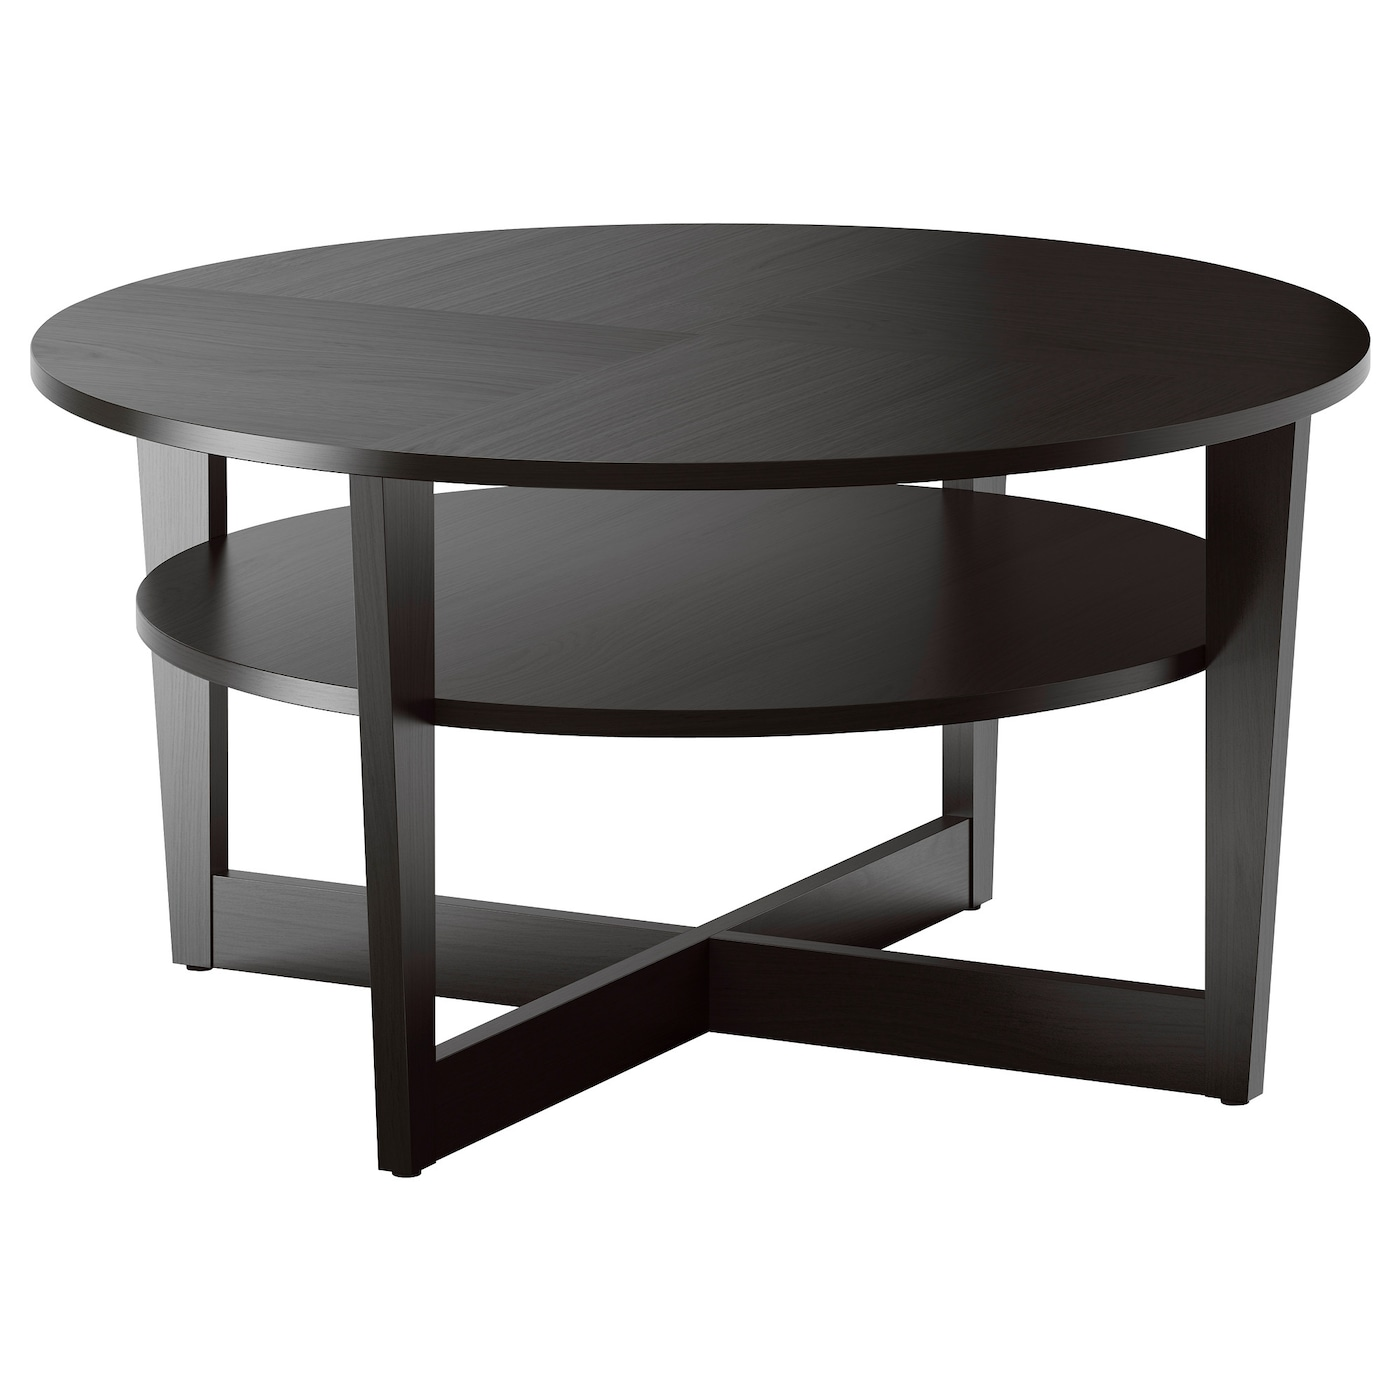 tables de salon design originales en verre en bois ikea. Black Bedroom Furniture Sets. Home Design Ideas